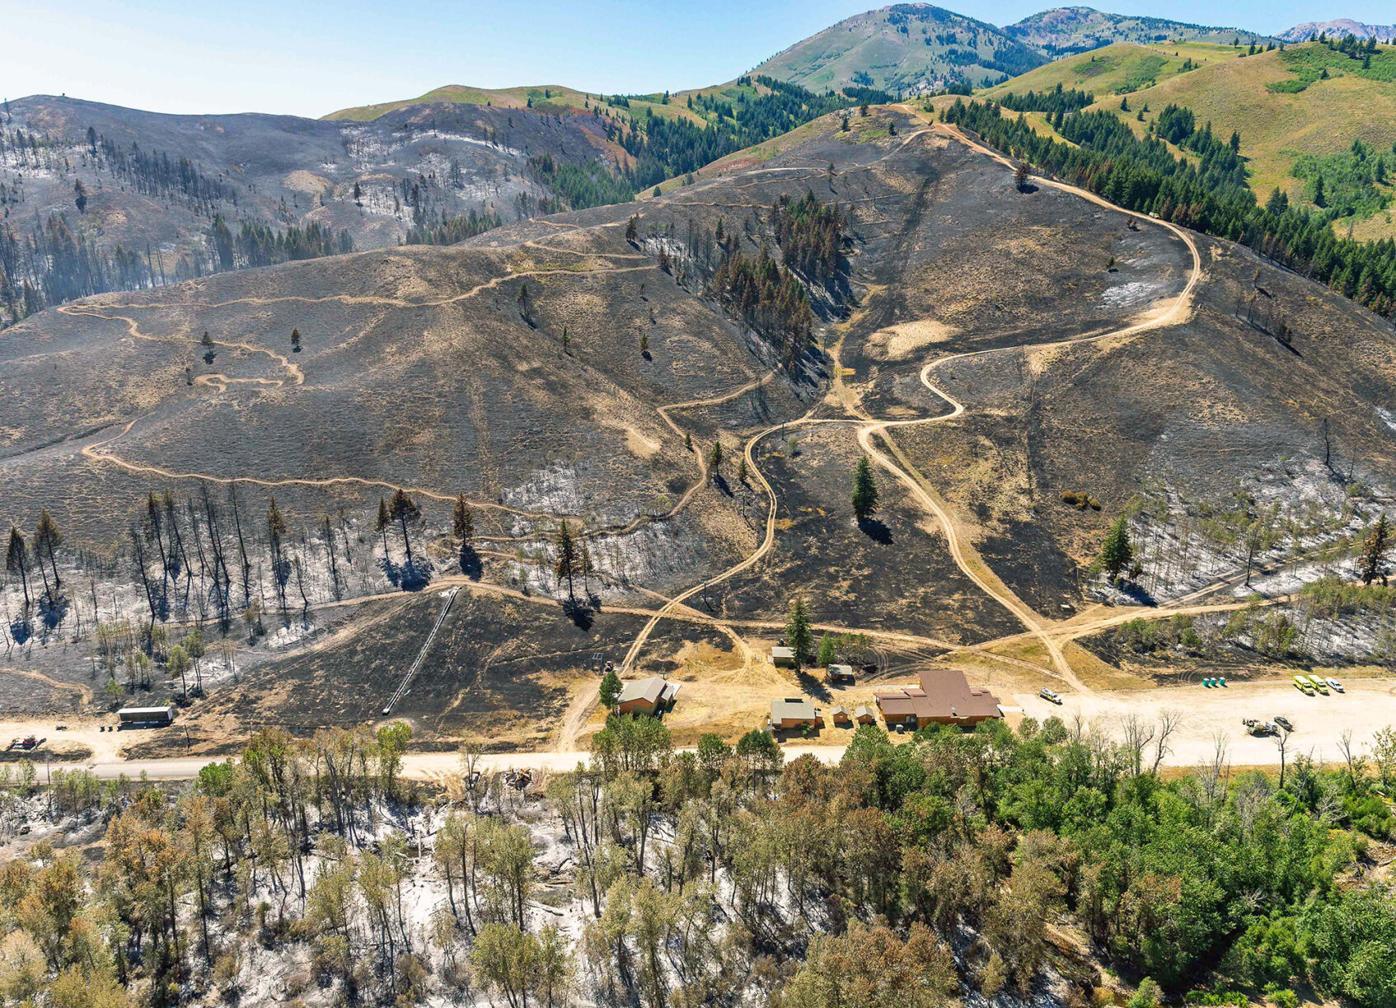 20-08-12 Phillips Creek Fire @ WF.jpg